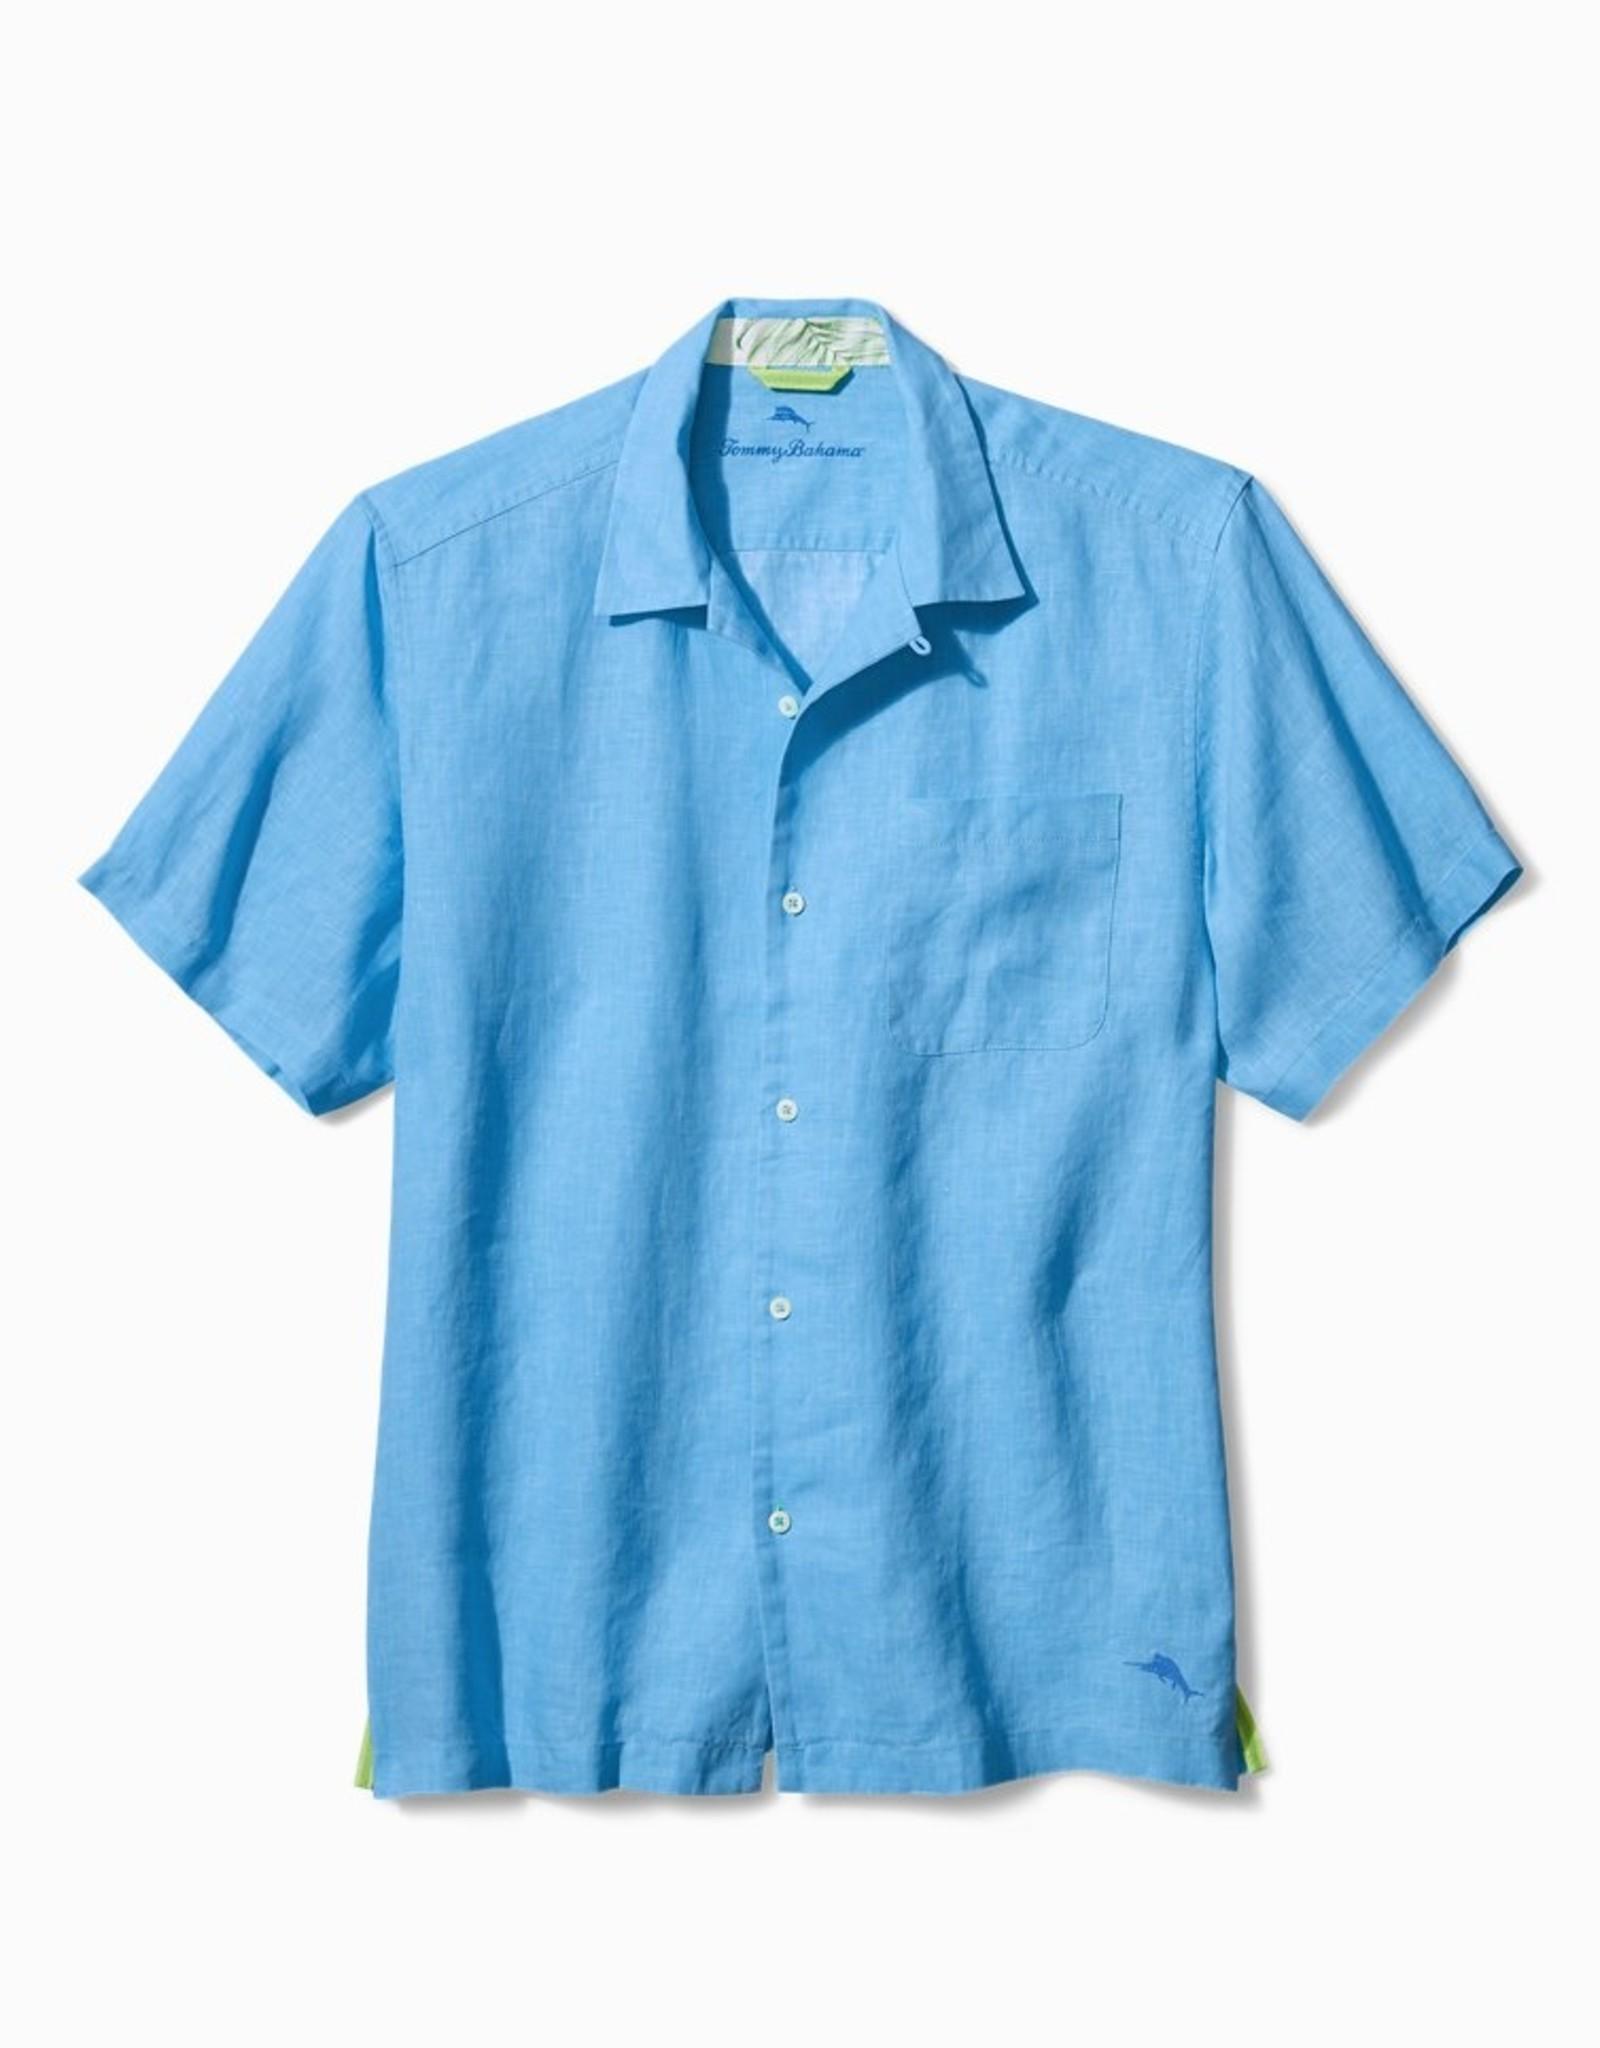 Tommy Bahama Sea Glass Short Sleeve